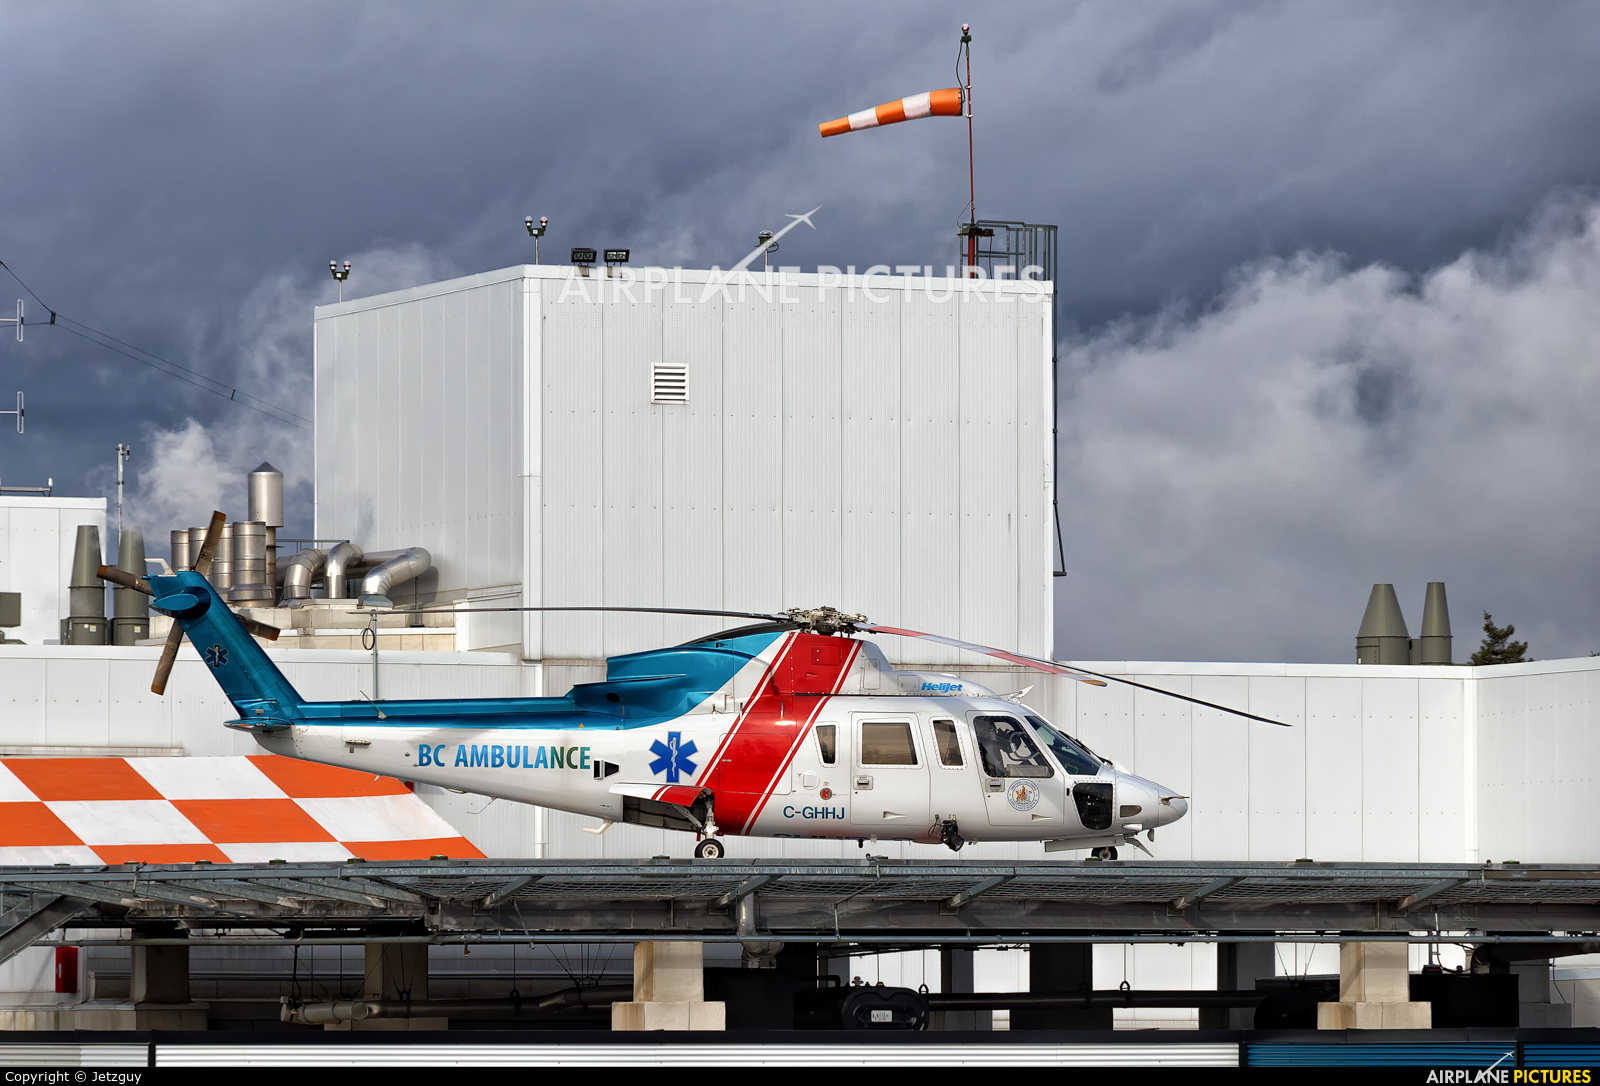 Helijet International C-GHHJ aircraft at Campbell River Hospital, BC